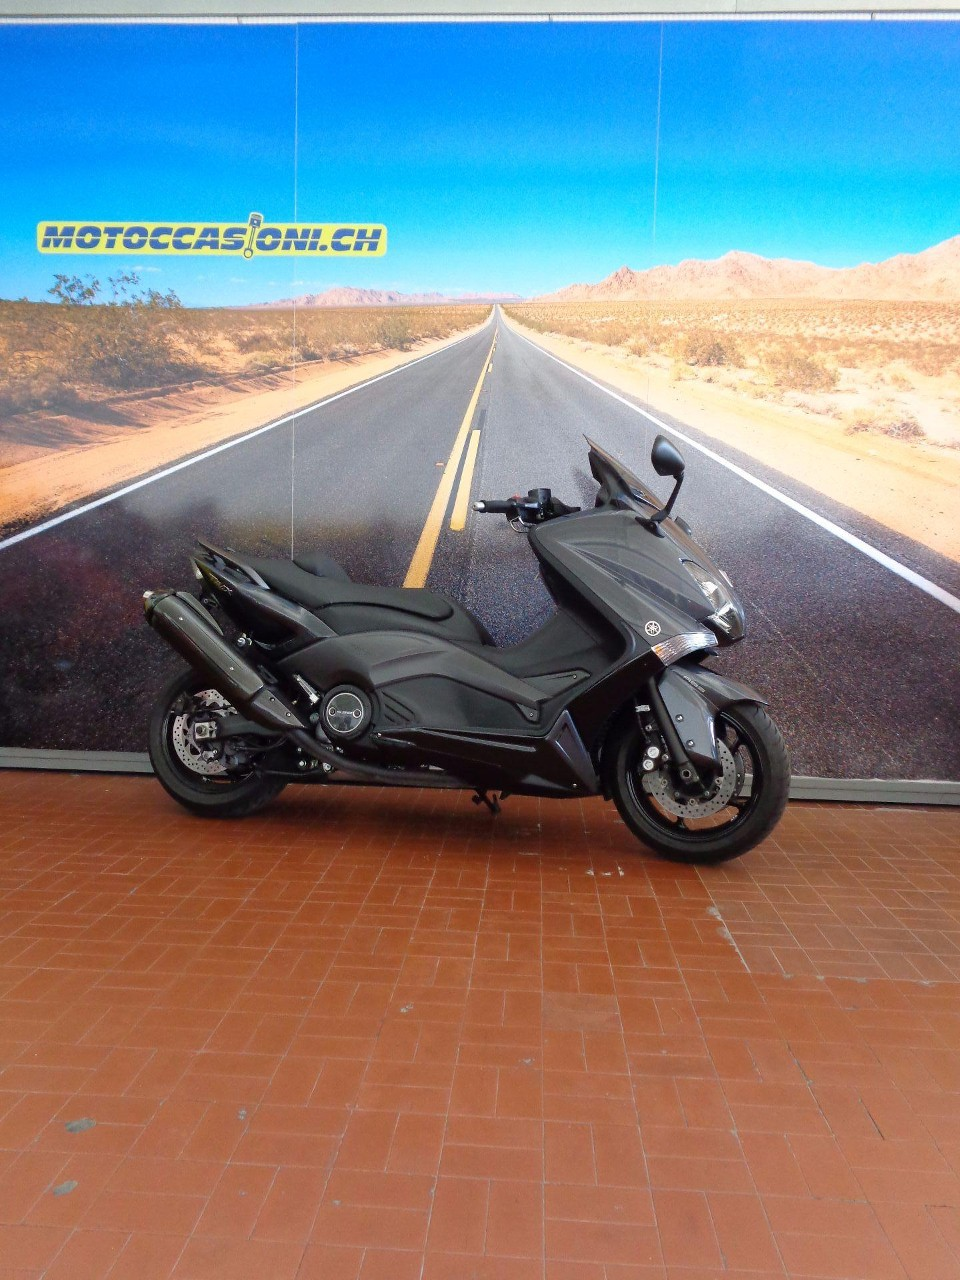 moto occasions acheter yamaha xp 500 tmax a abs 530 abs motoccasioni sa grancia. Black Bedroom Furniture Sets. Home Design Ideas